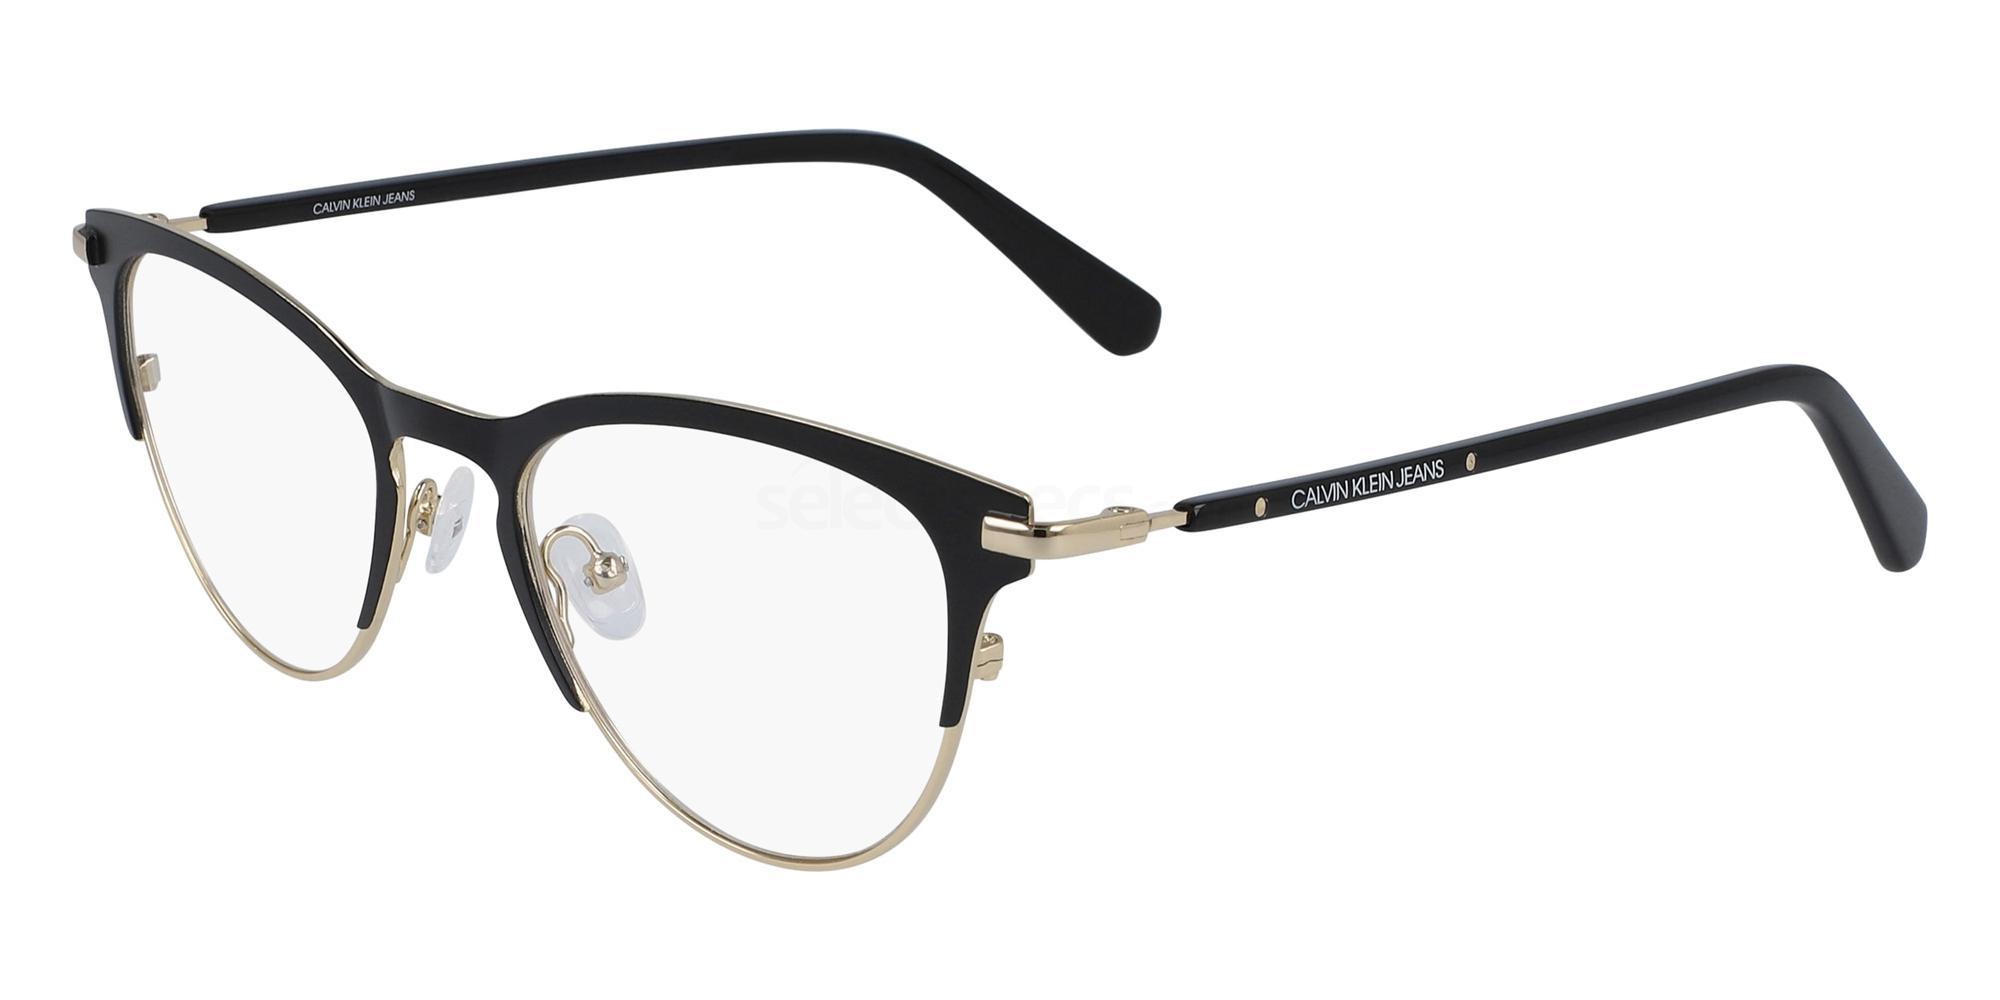 001 CKJ20302 Glasses, Calvin Klein Jeans